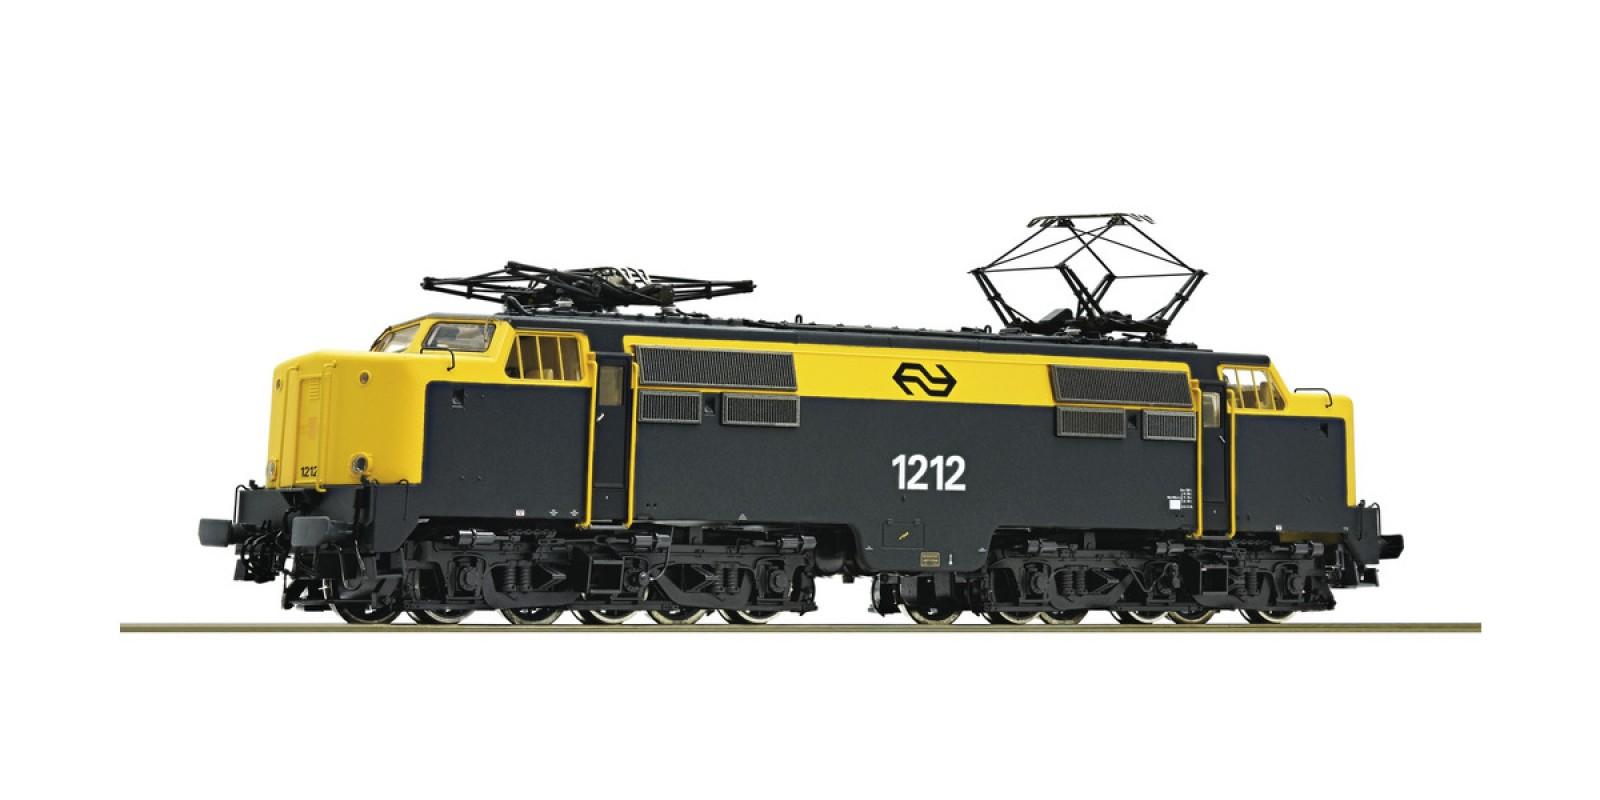 RO79831 Electric locomotive 1212, NS